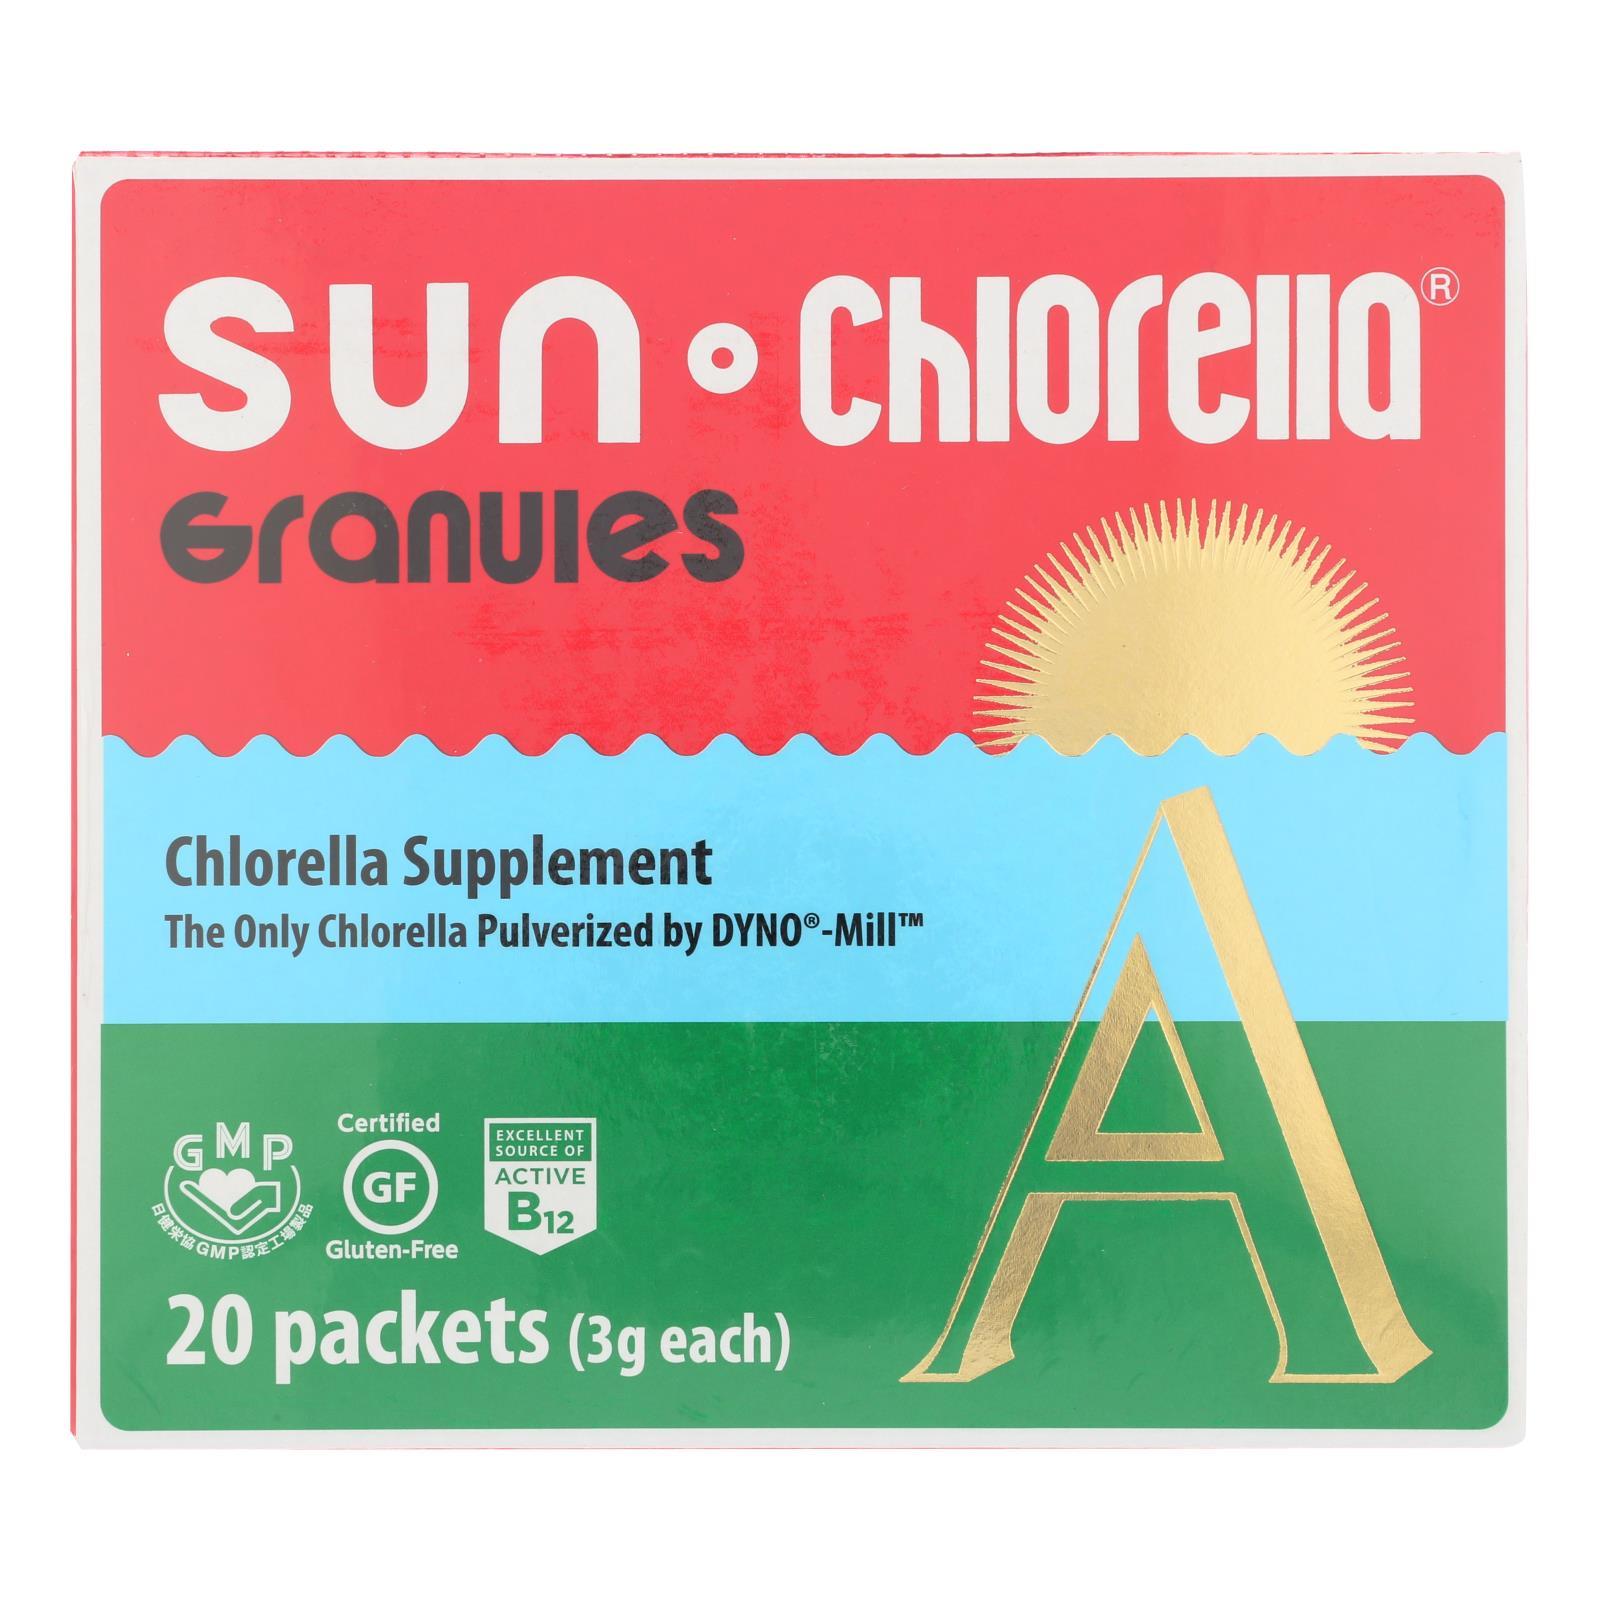 Sun Chlorella A Granules - 20 Individually Wrapped Packs